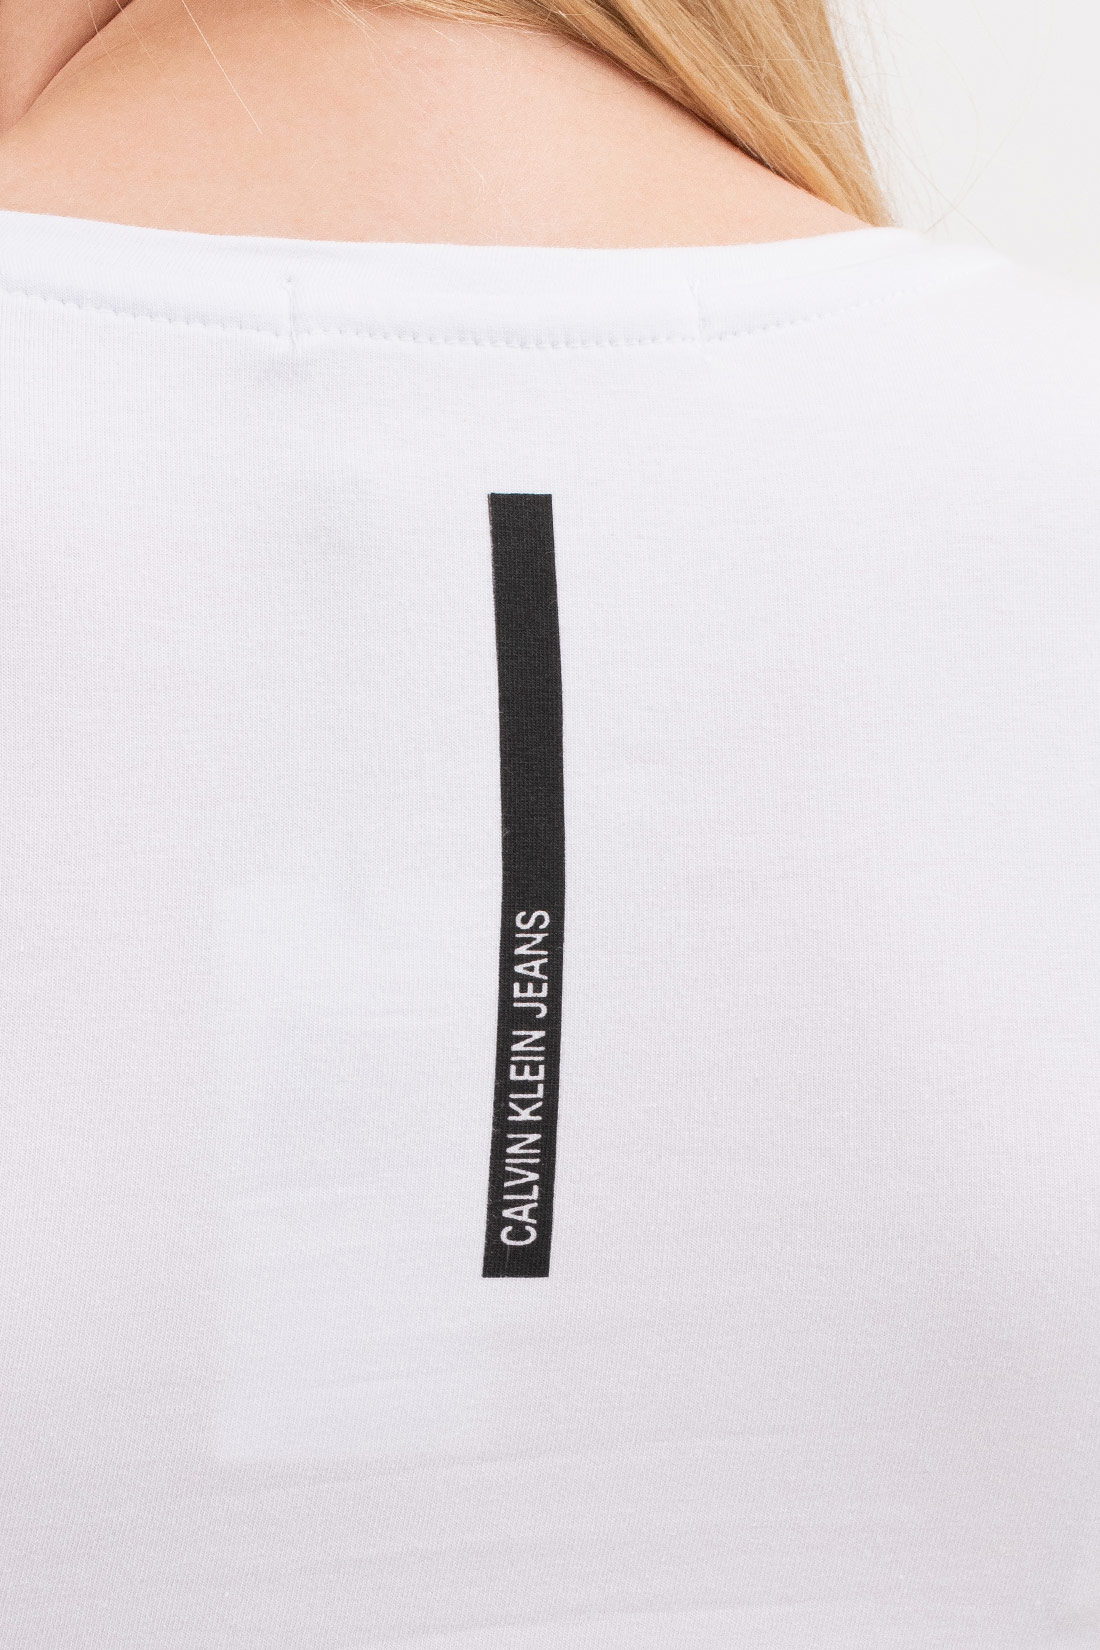 T Shirt Calvin Klein Ck Metalico